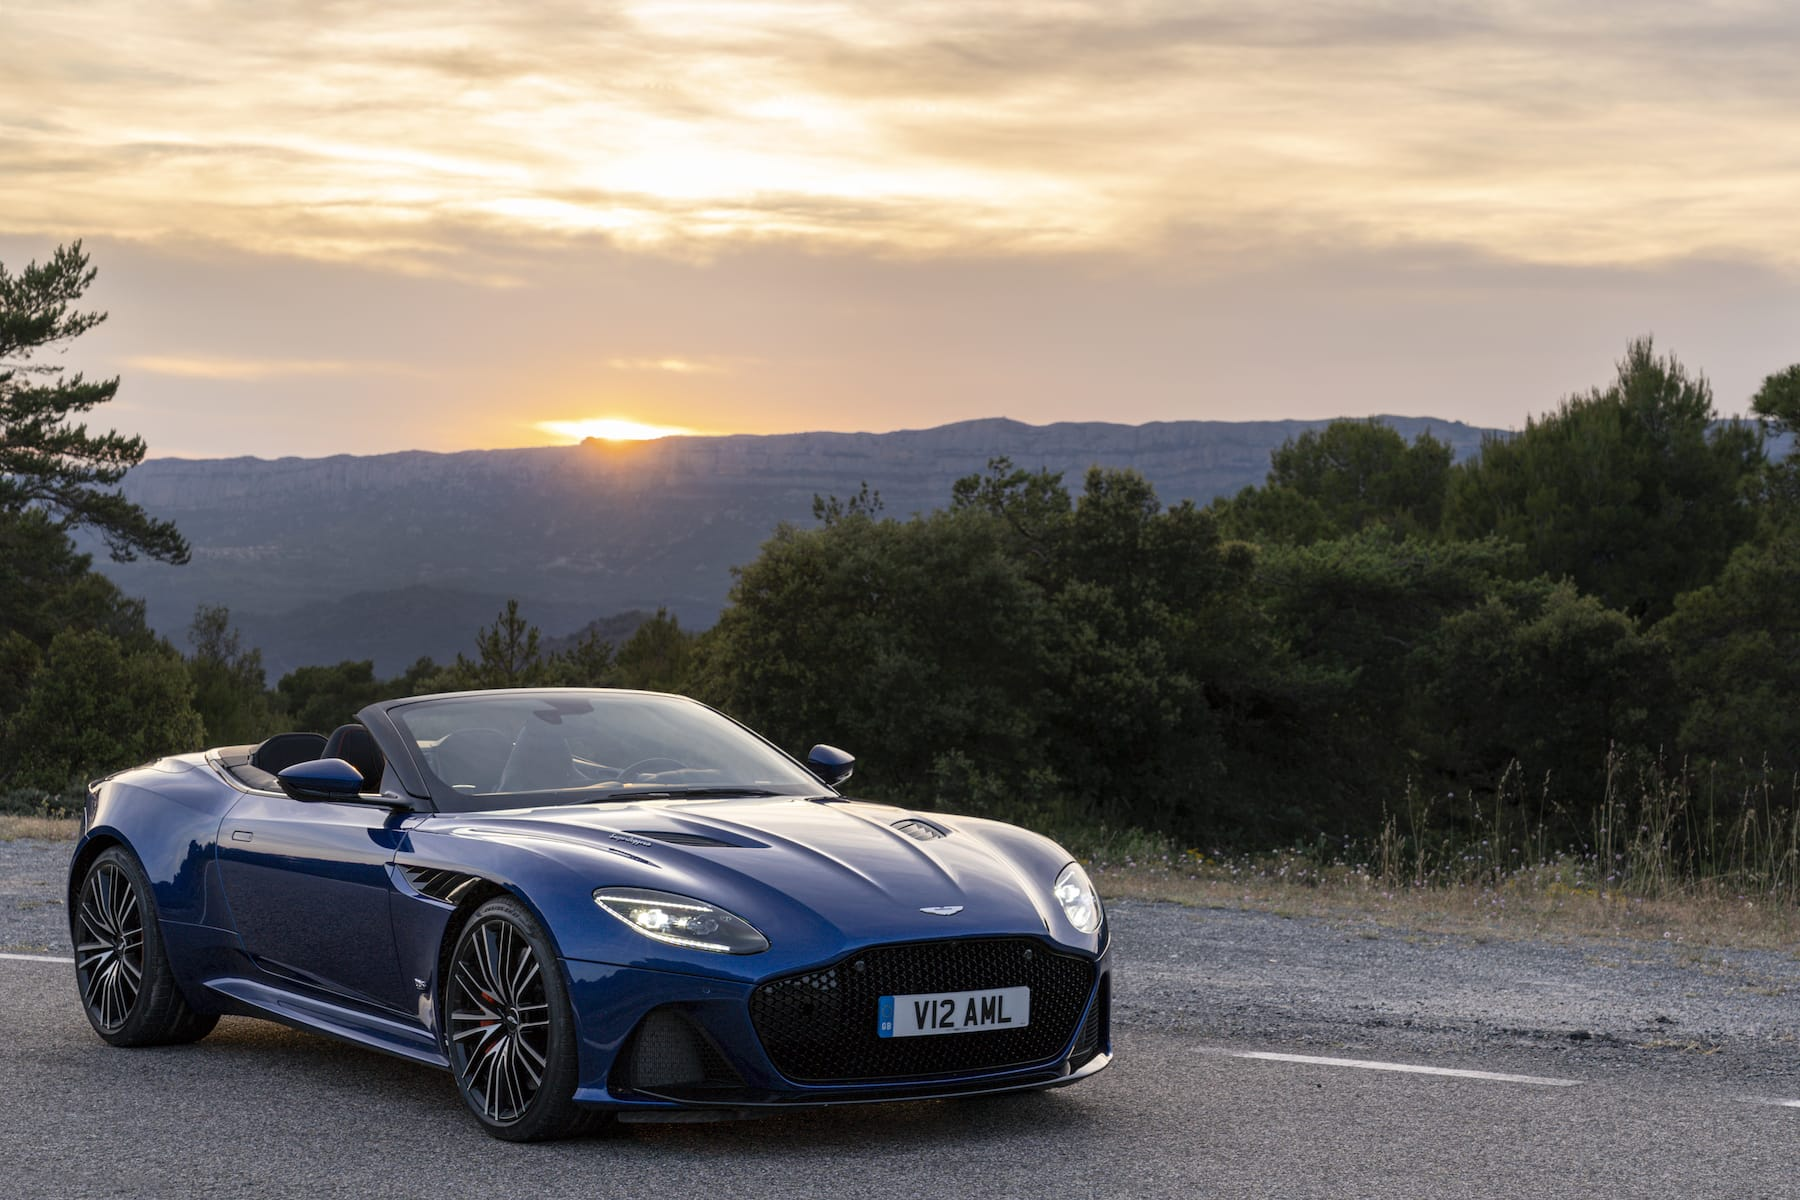 Aston Martin DBS Volante (2018 onwards) – front view